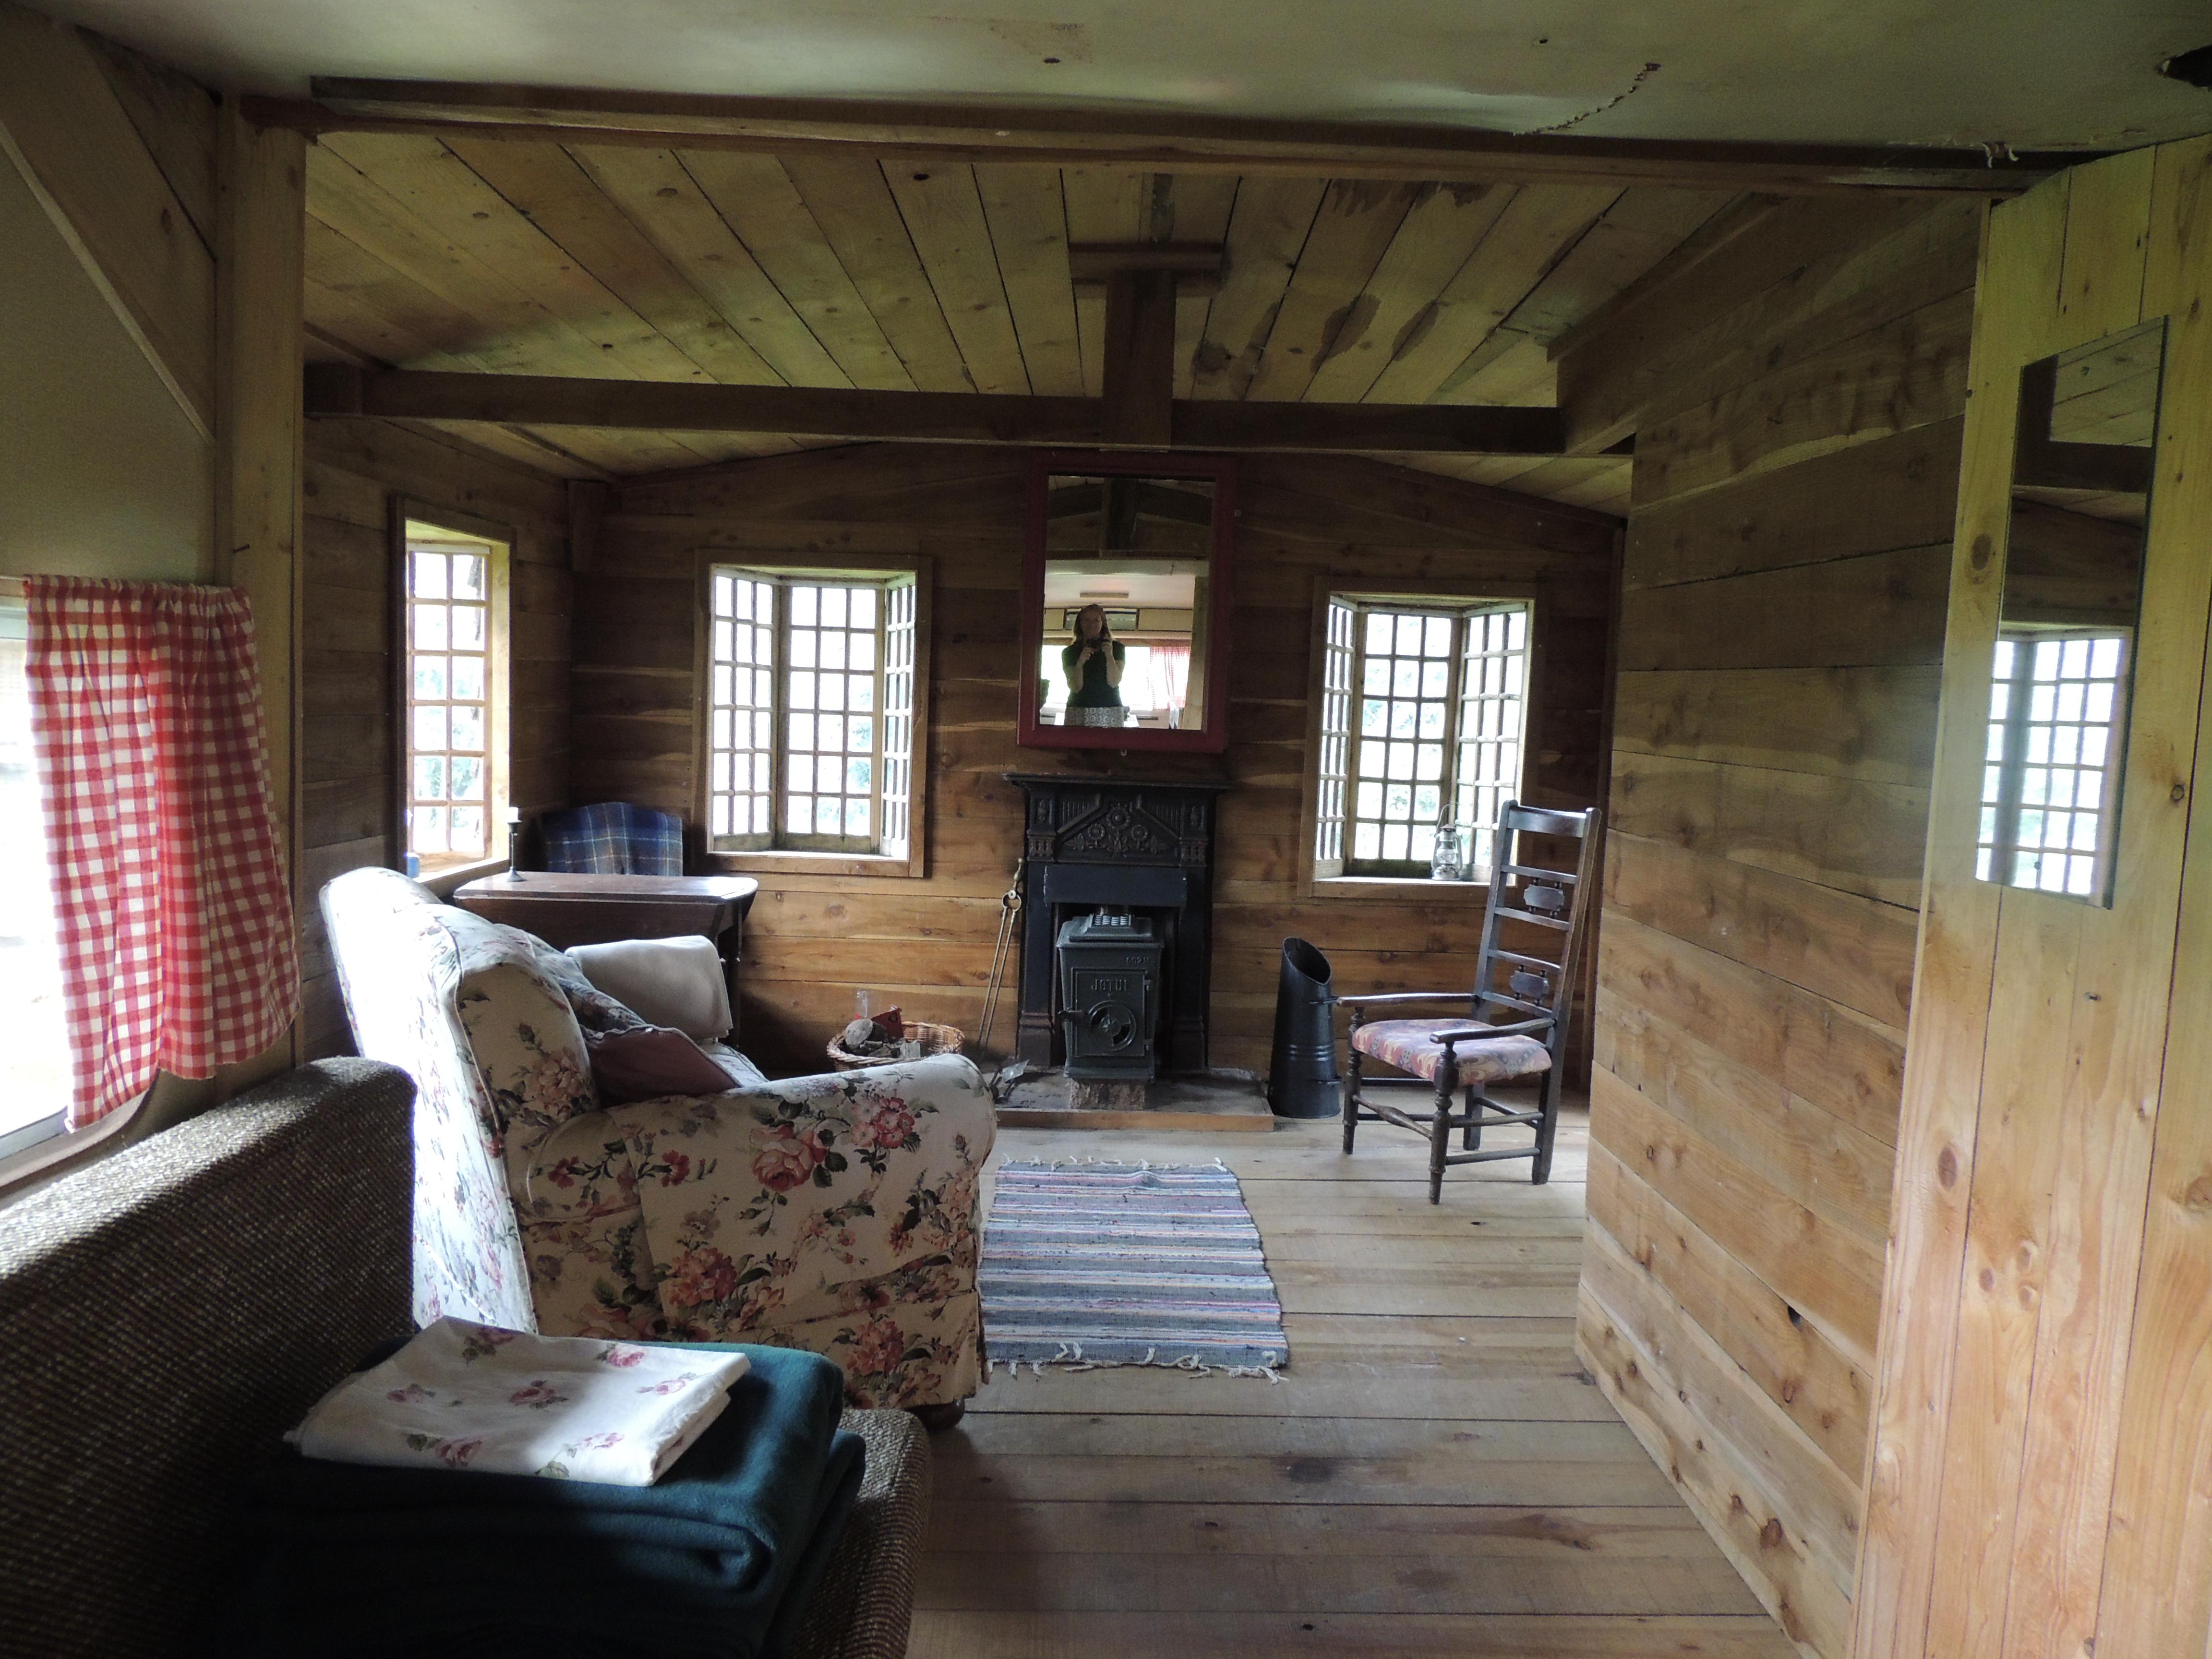 Interior of Fishing hut pre renovations